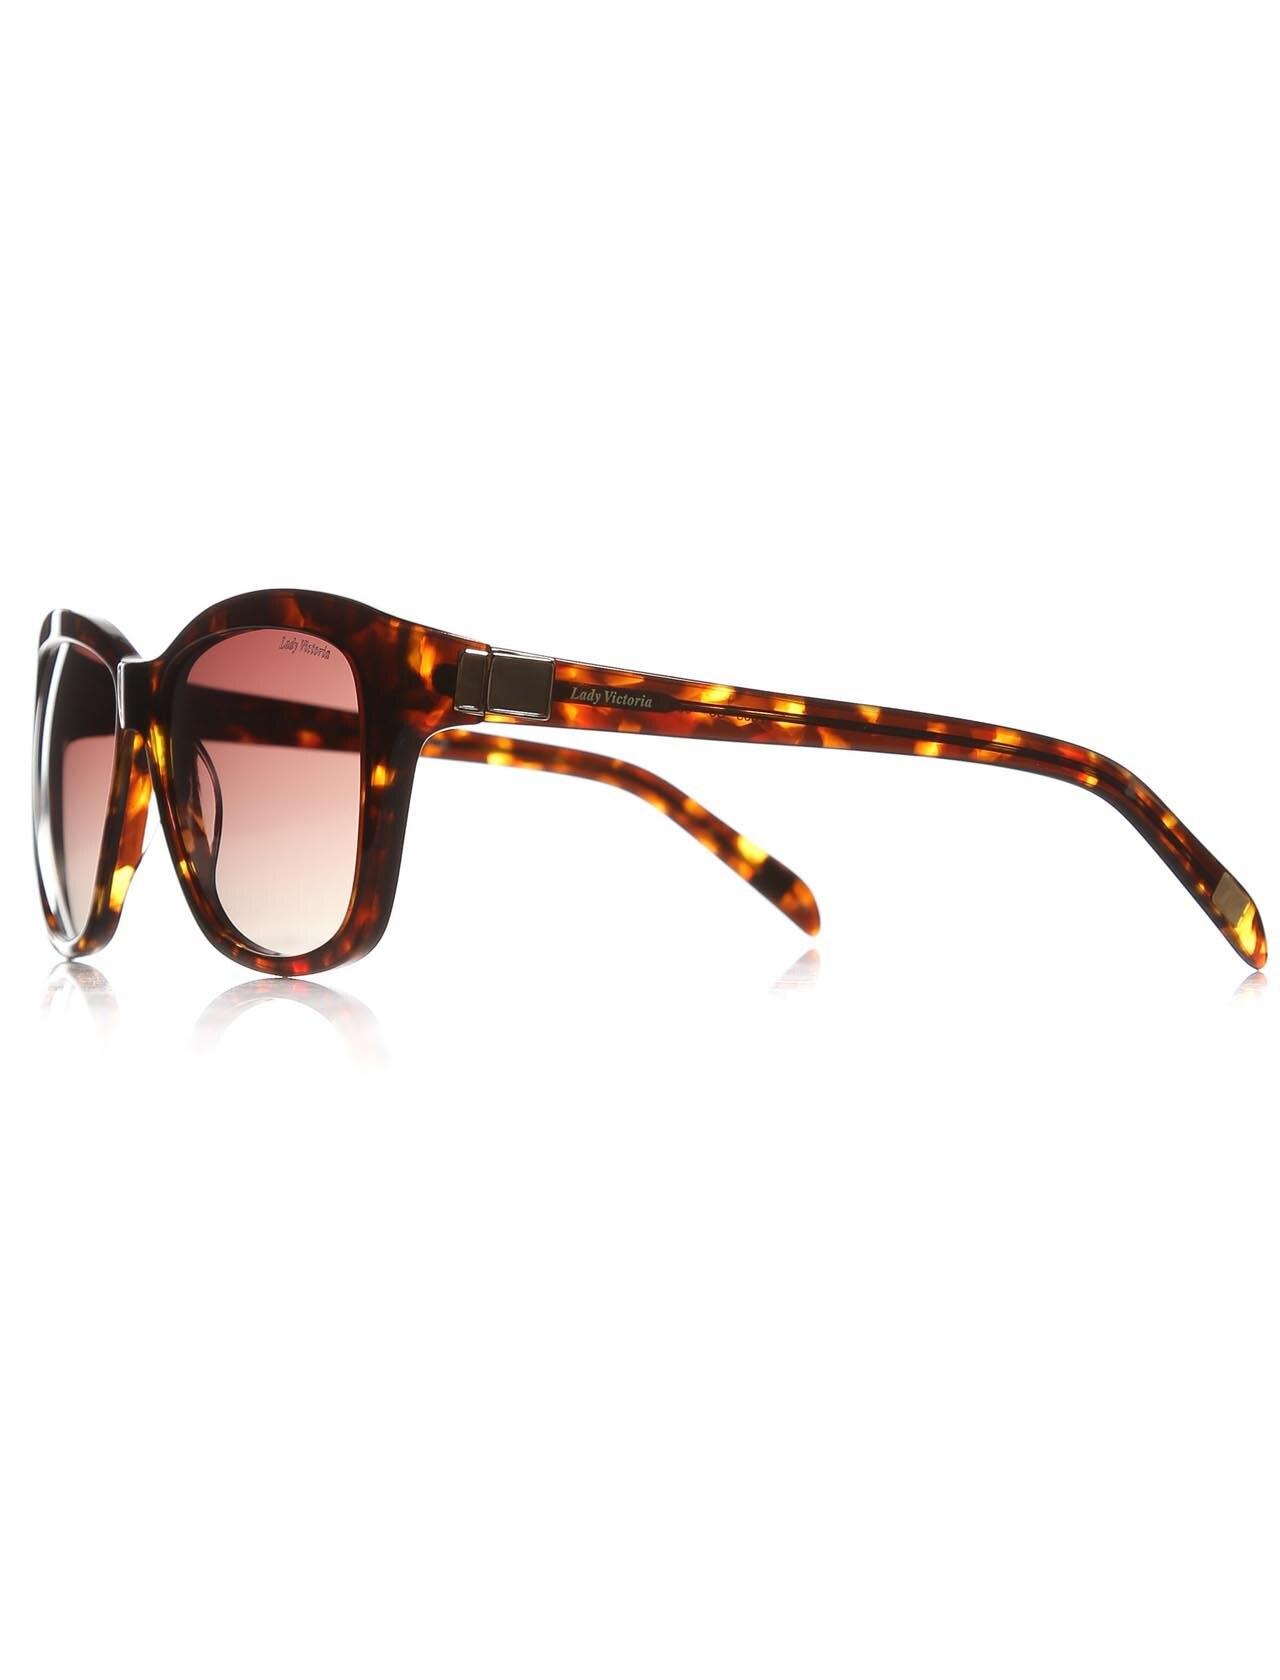 Women's sunglasses ldy 7003 03 bone Brown organic rectangle rectangular 55-15-135 lady victoria